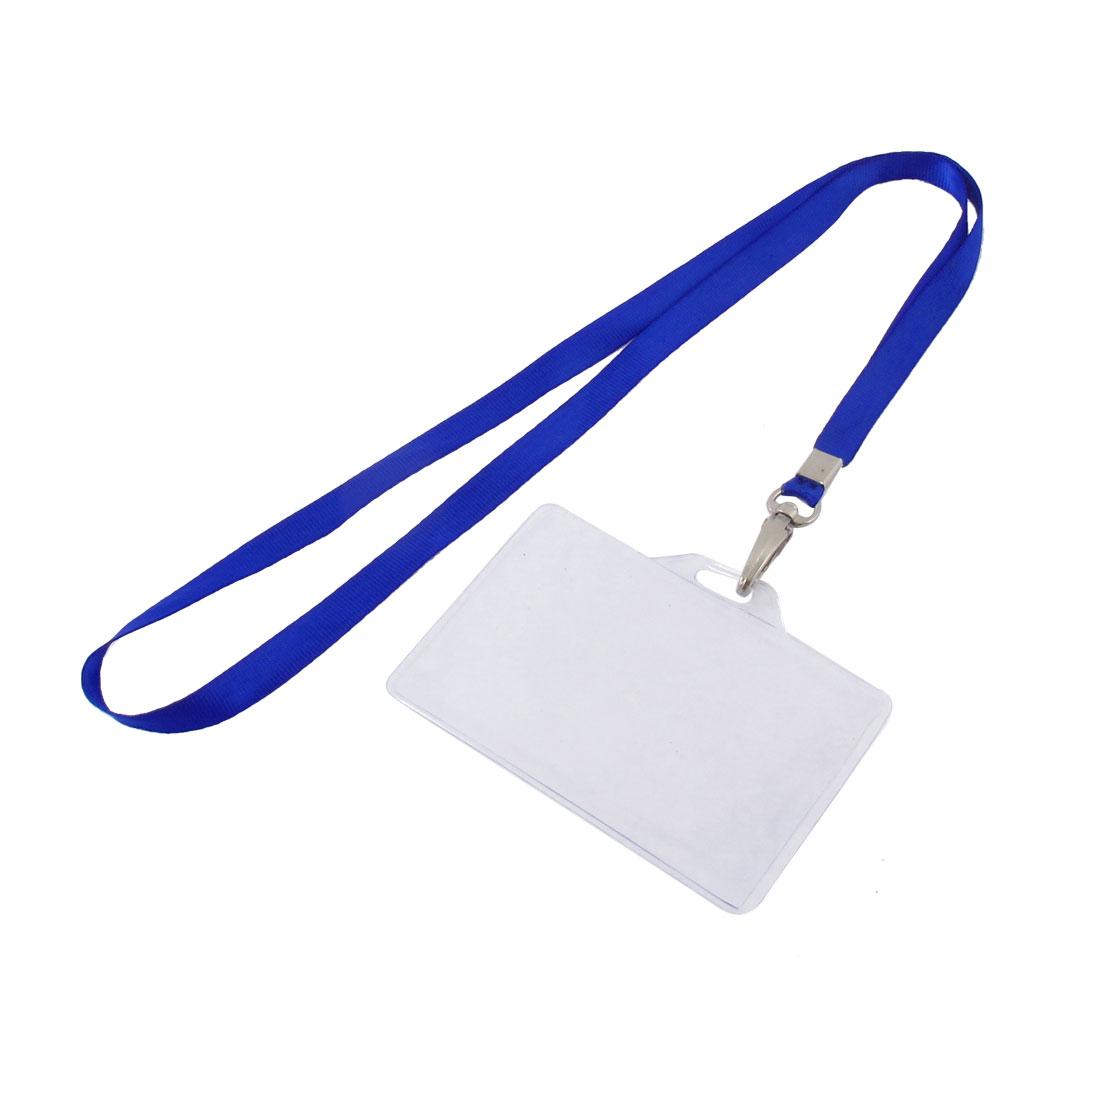 Lanyard Plastic Horizontal ID Name Employee Badge Card Holder Blue Clear